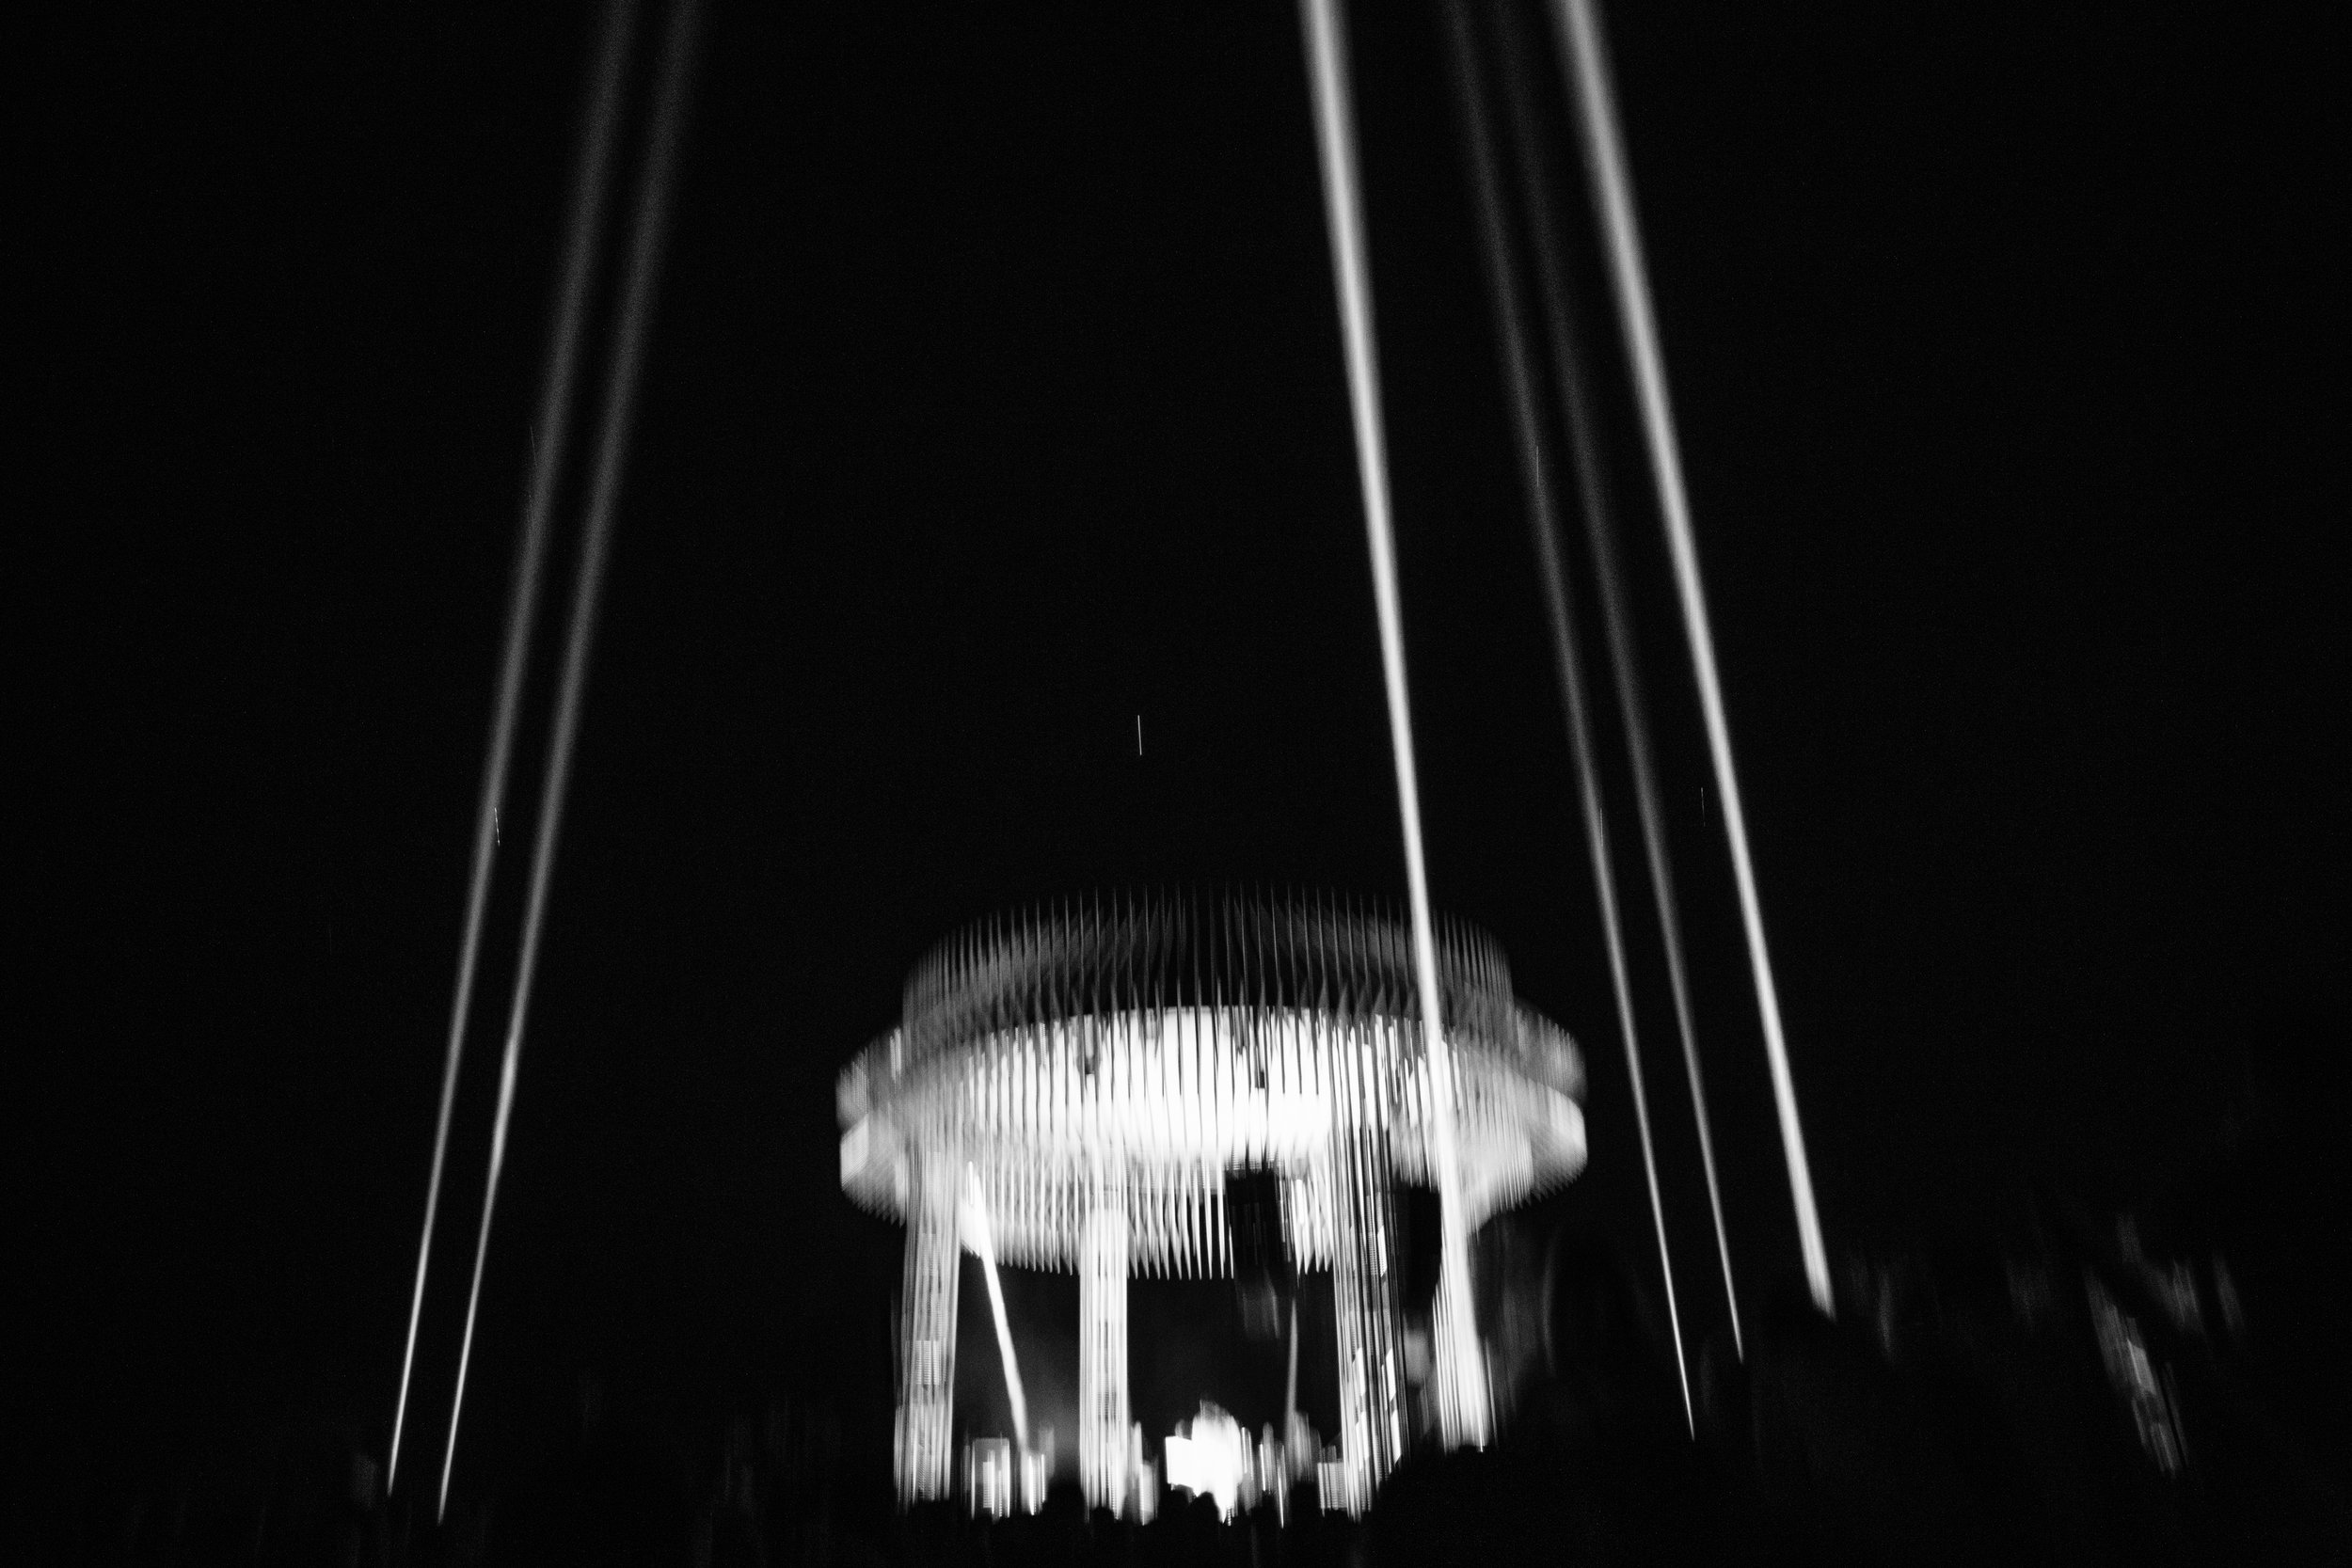 UFO_ZOEPRINDSFLASH-5999.jpg